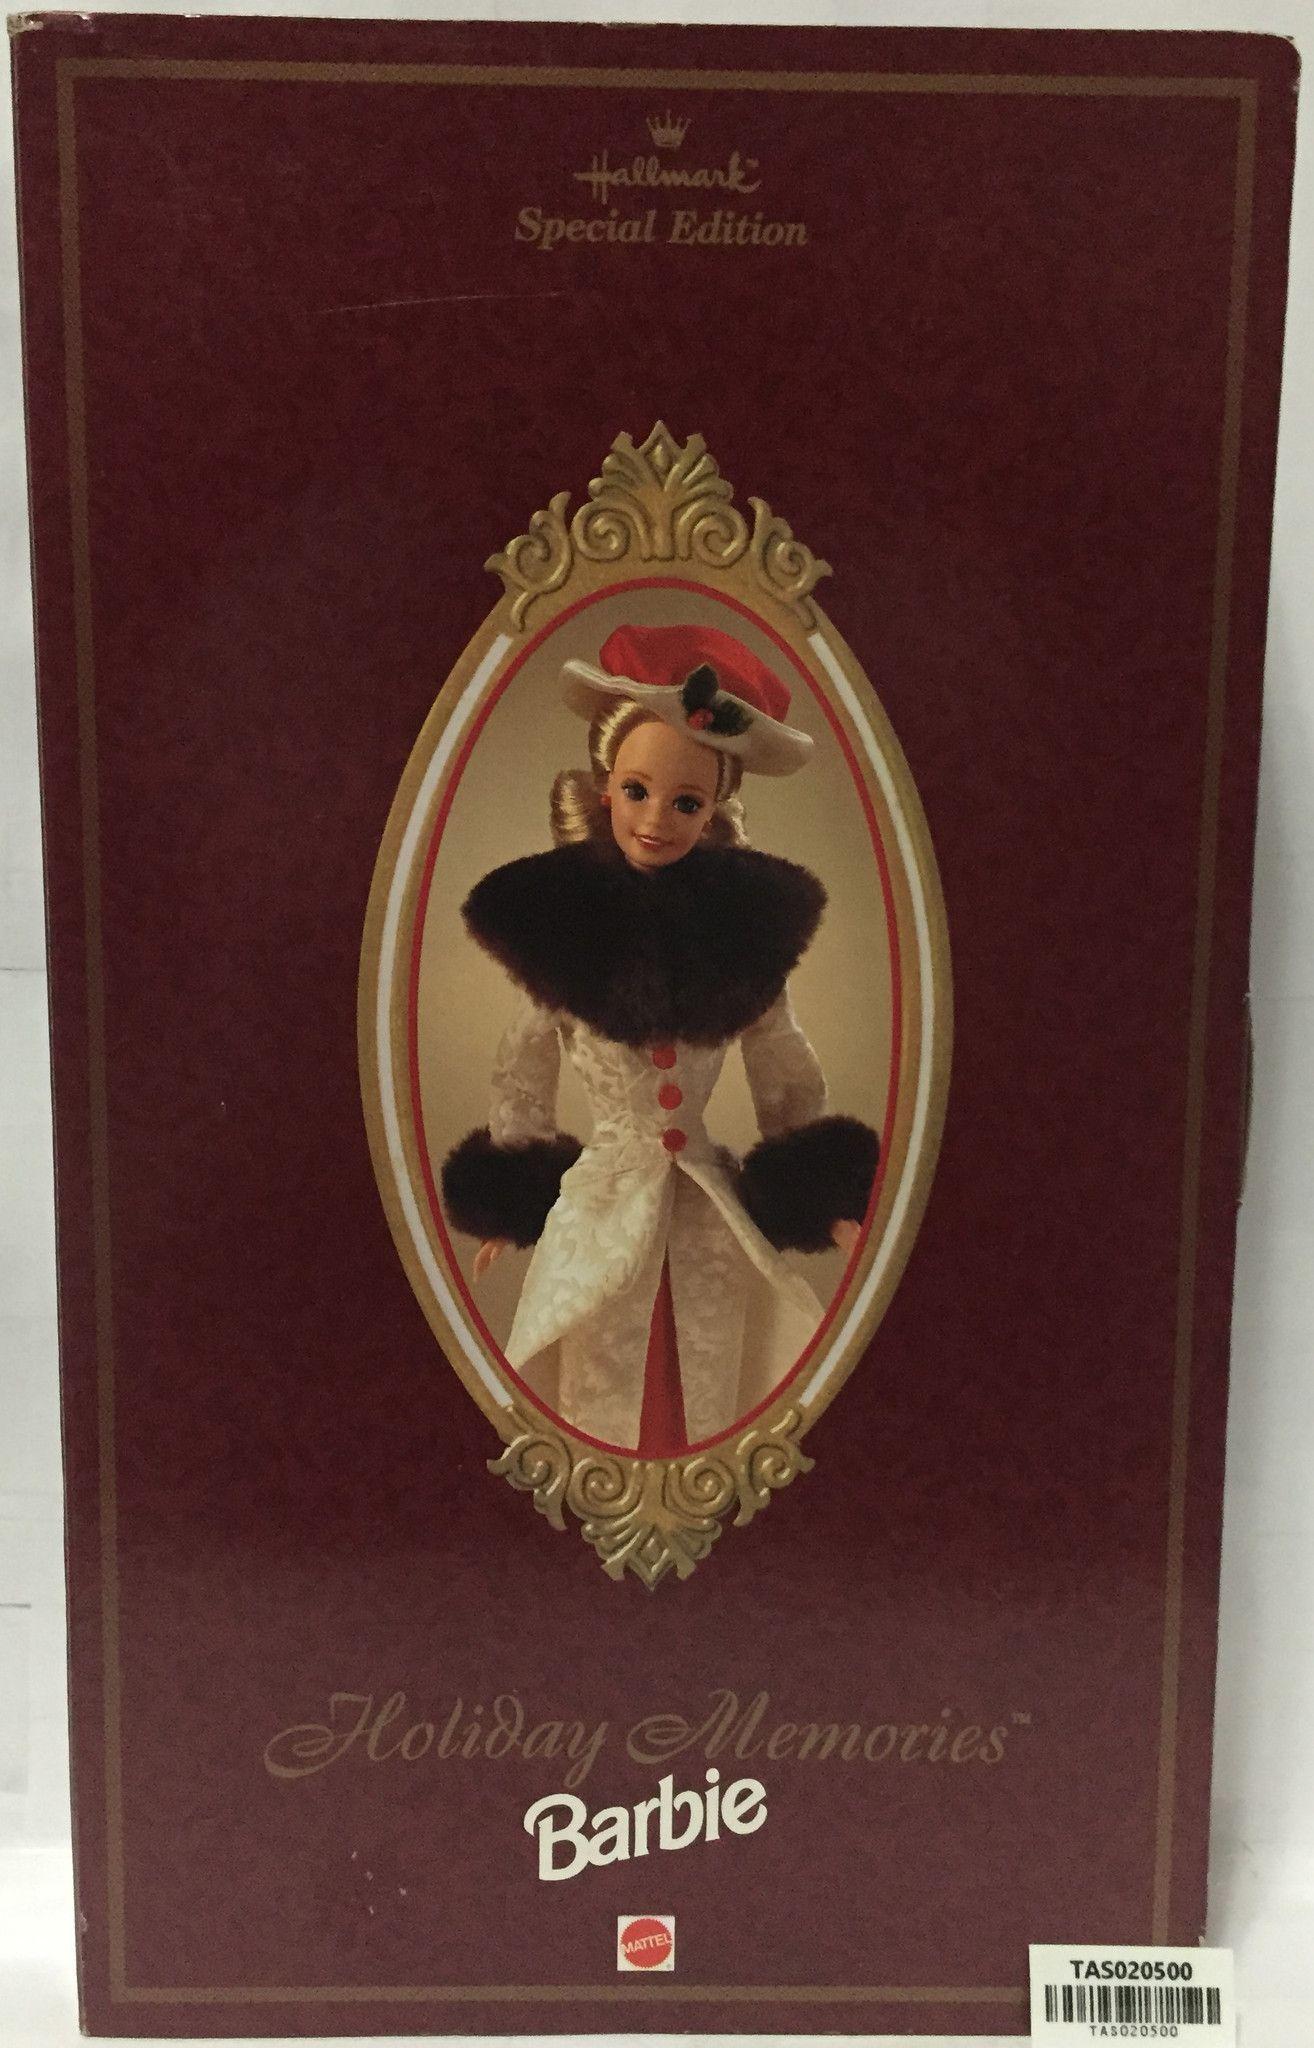 (TAS020500) - 1995 Mattel Special Edition Holiday Memories Barbie